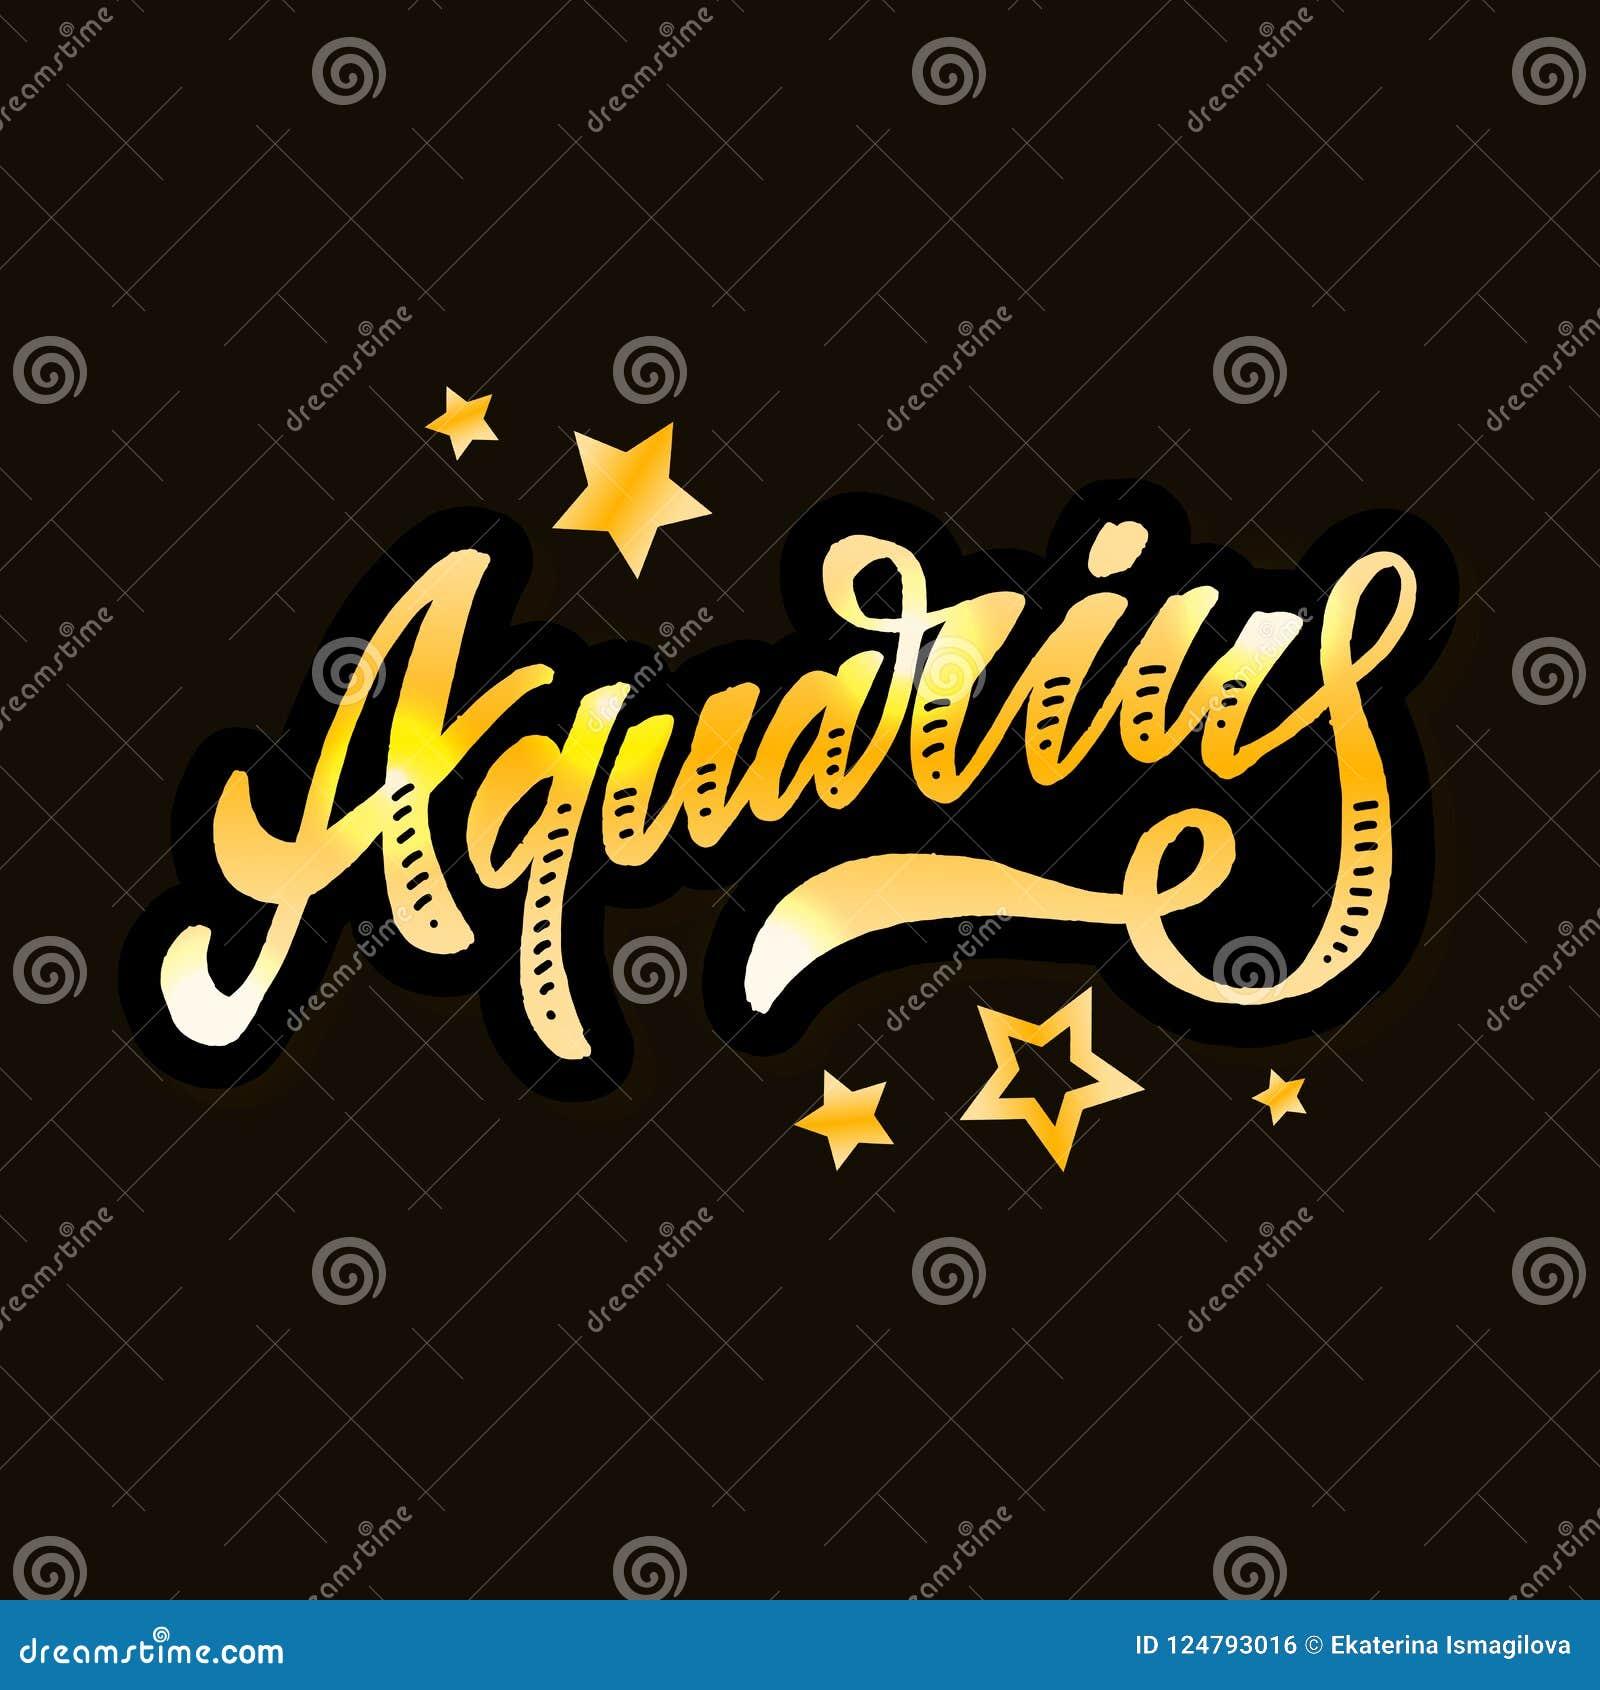 Aquarius Lettering Calligraphy Brush Text Horoscope Zodiac Sign